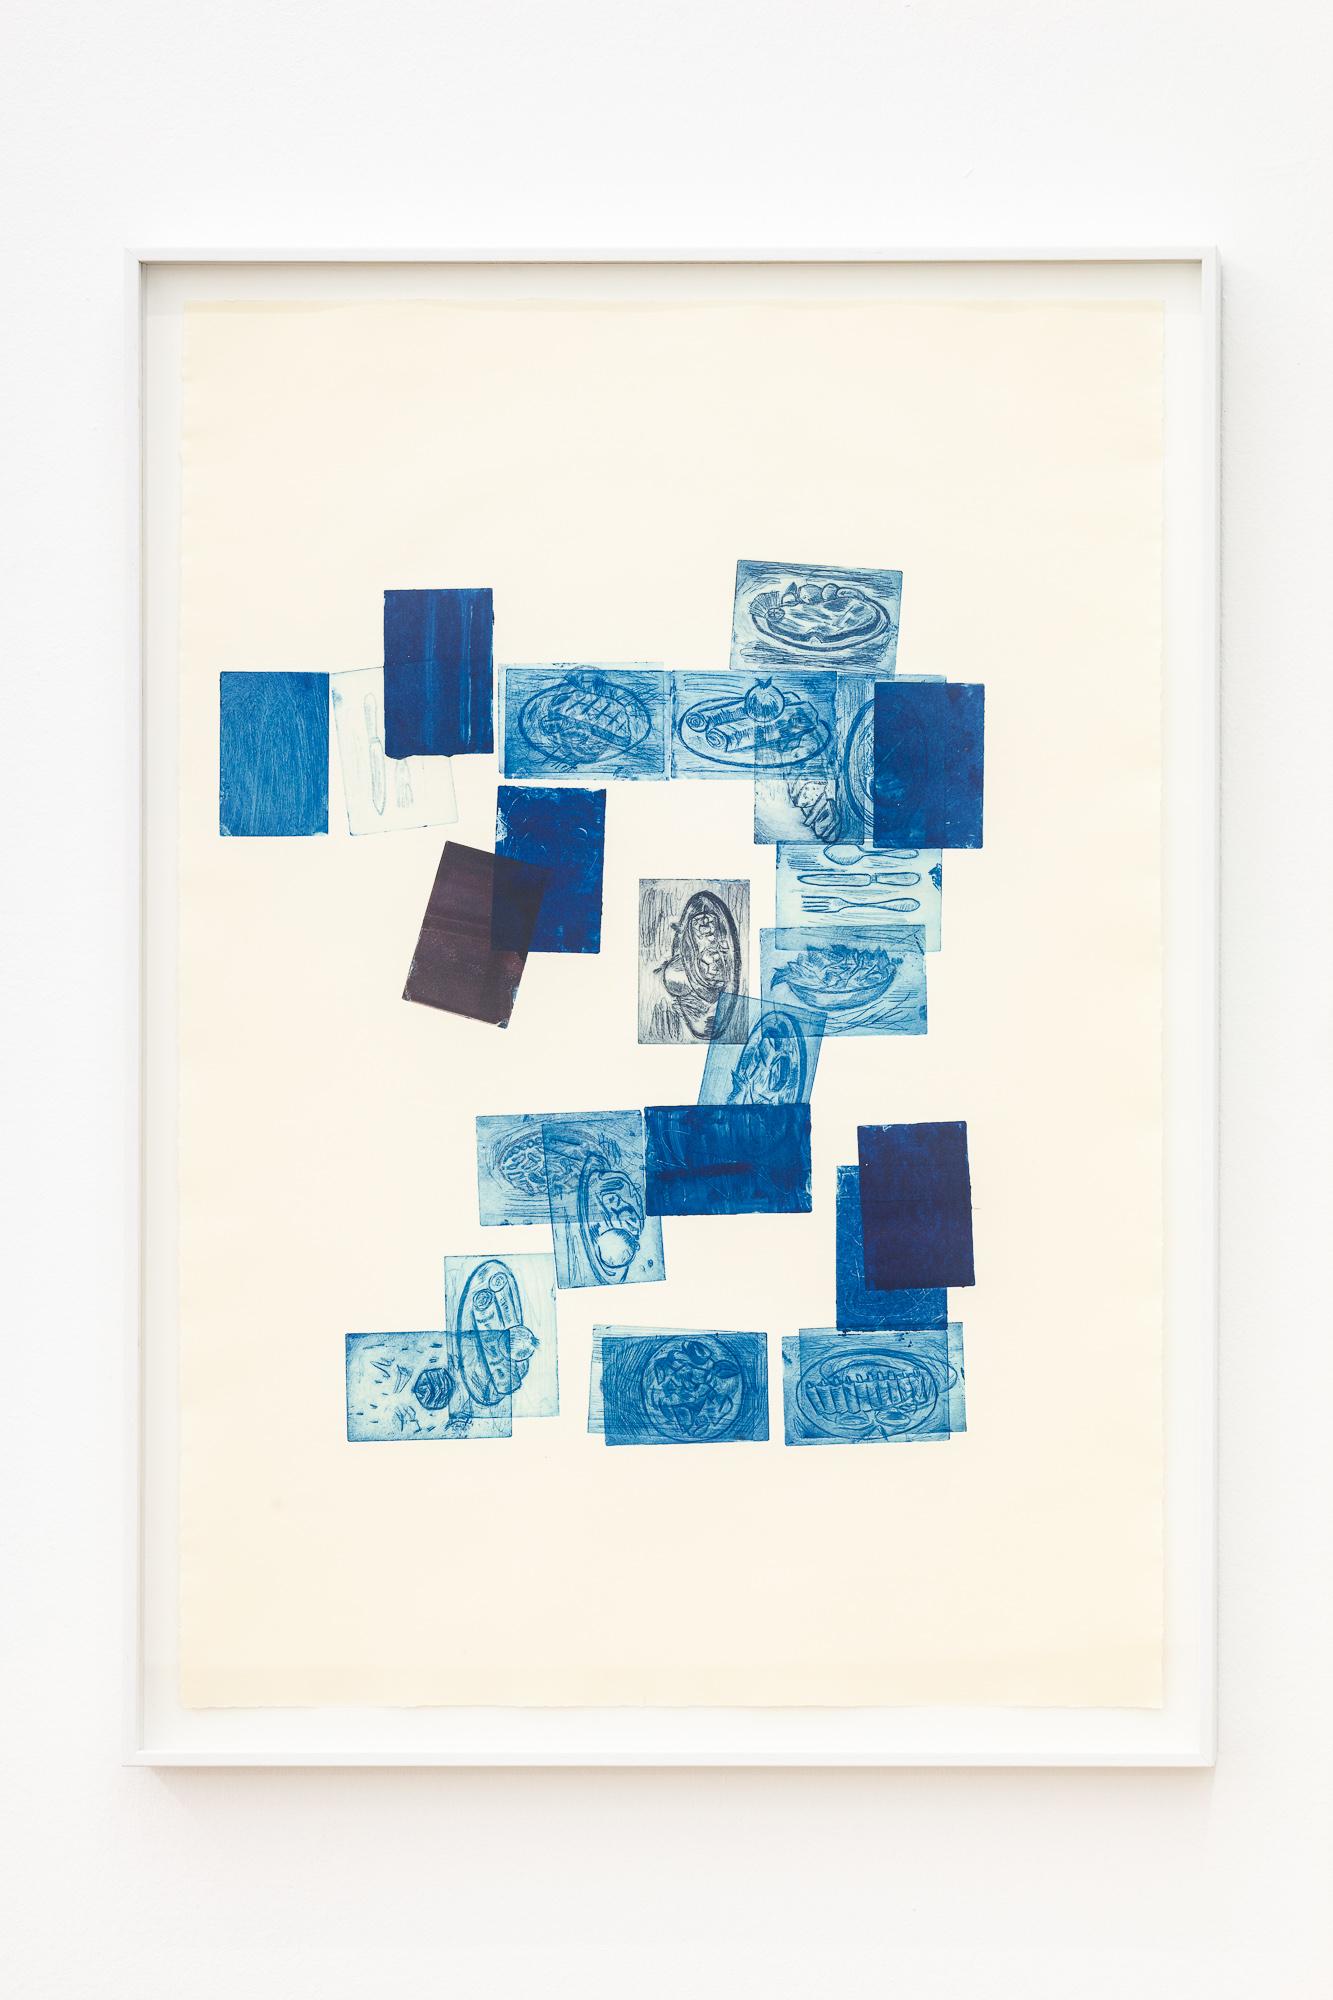 2019_01_25_Knut Ivar Aaser at Felix Gaudlitz_by kunst-dokumentationcom_Werkbilder_021_web.jpg